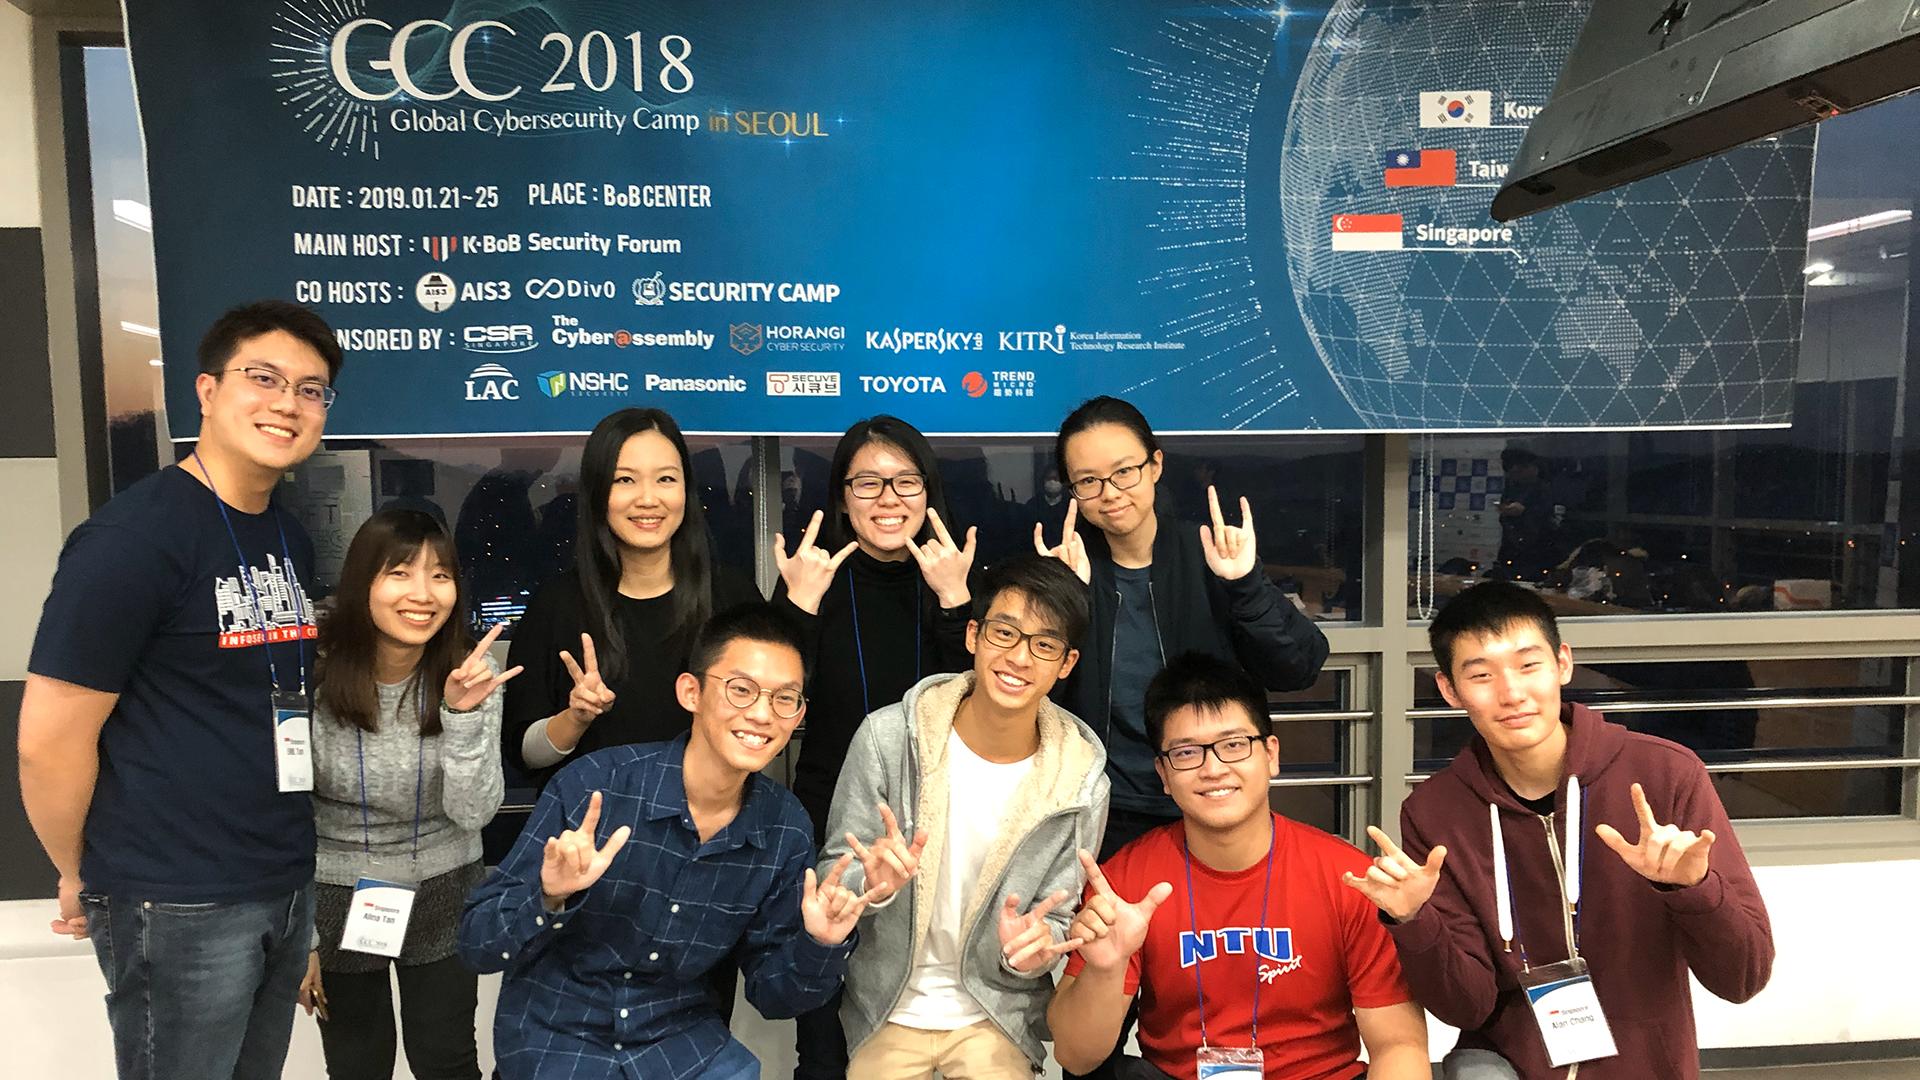 GCC 2019 Seoul